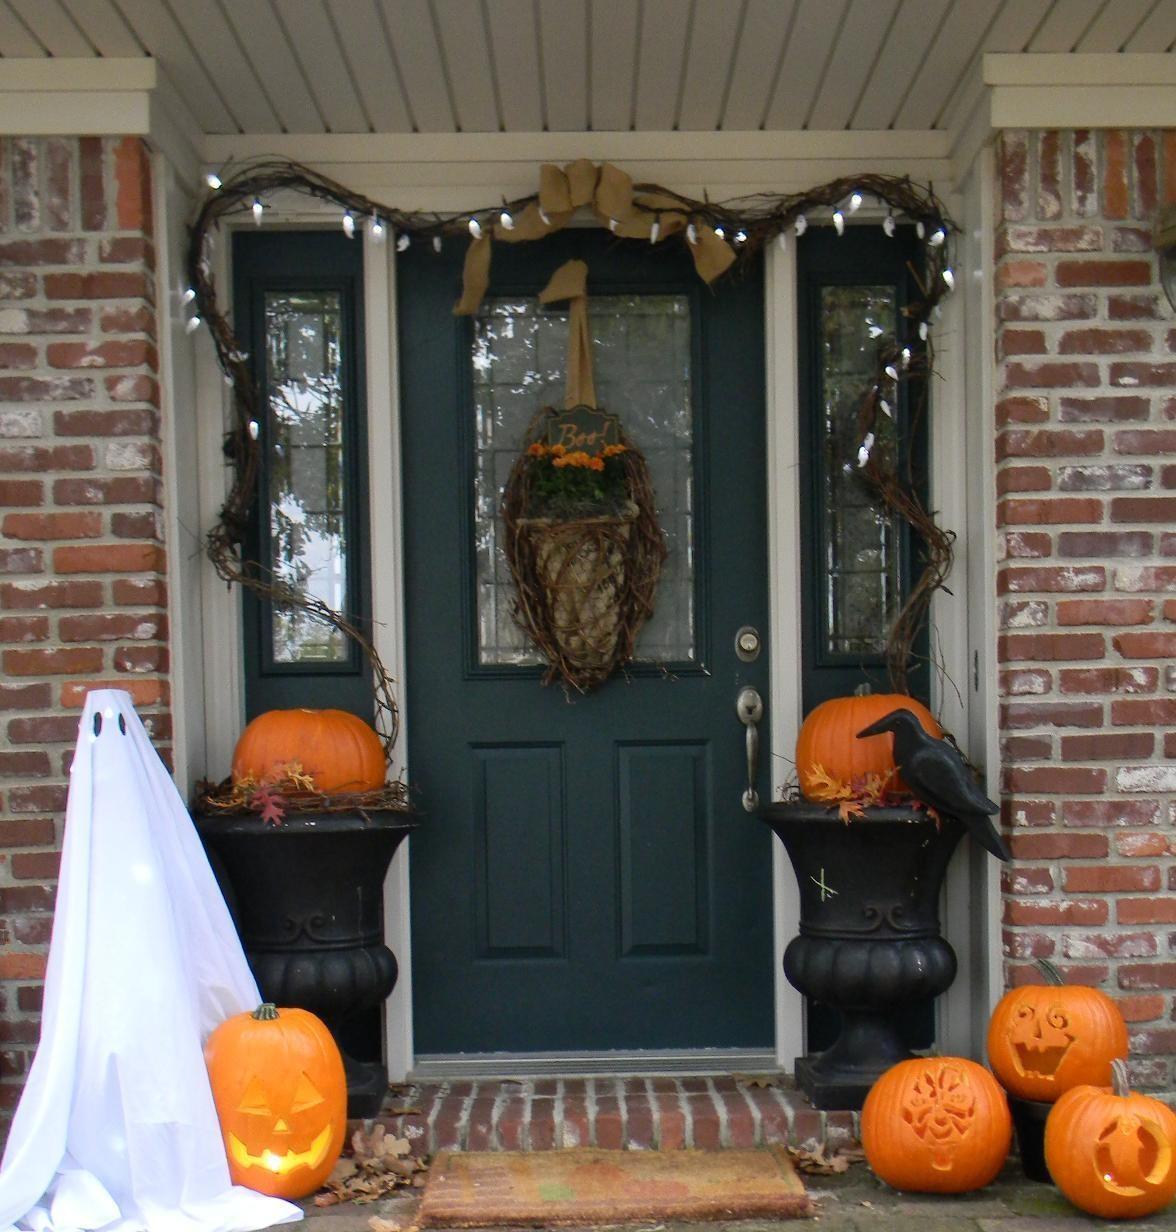 abbellire-porta-ingresso-per-halloween-7